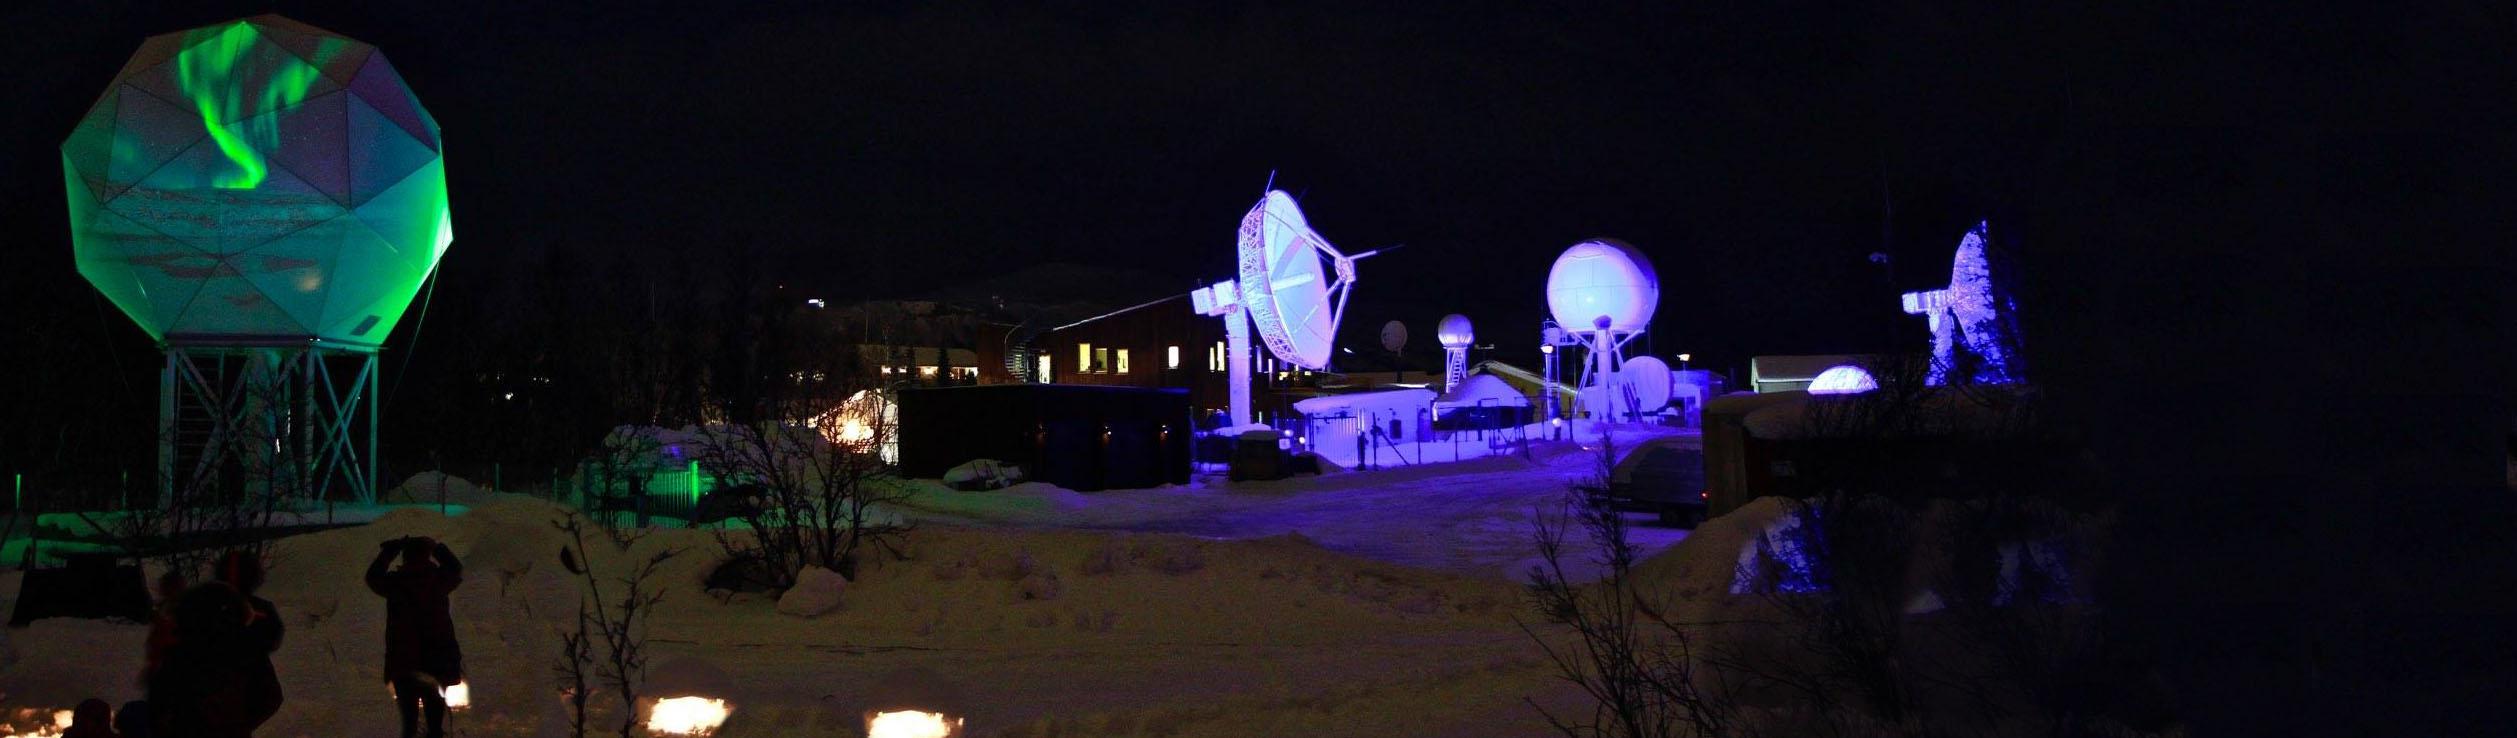 Svalbard Norway KSAt minus 30c